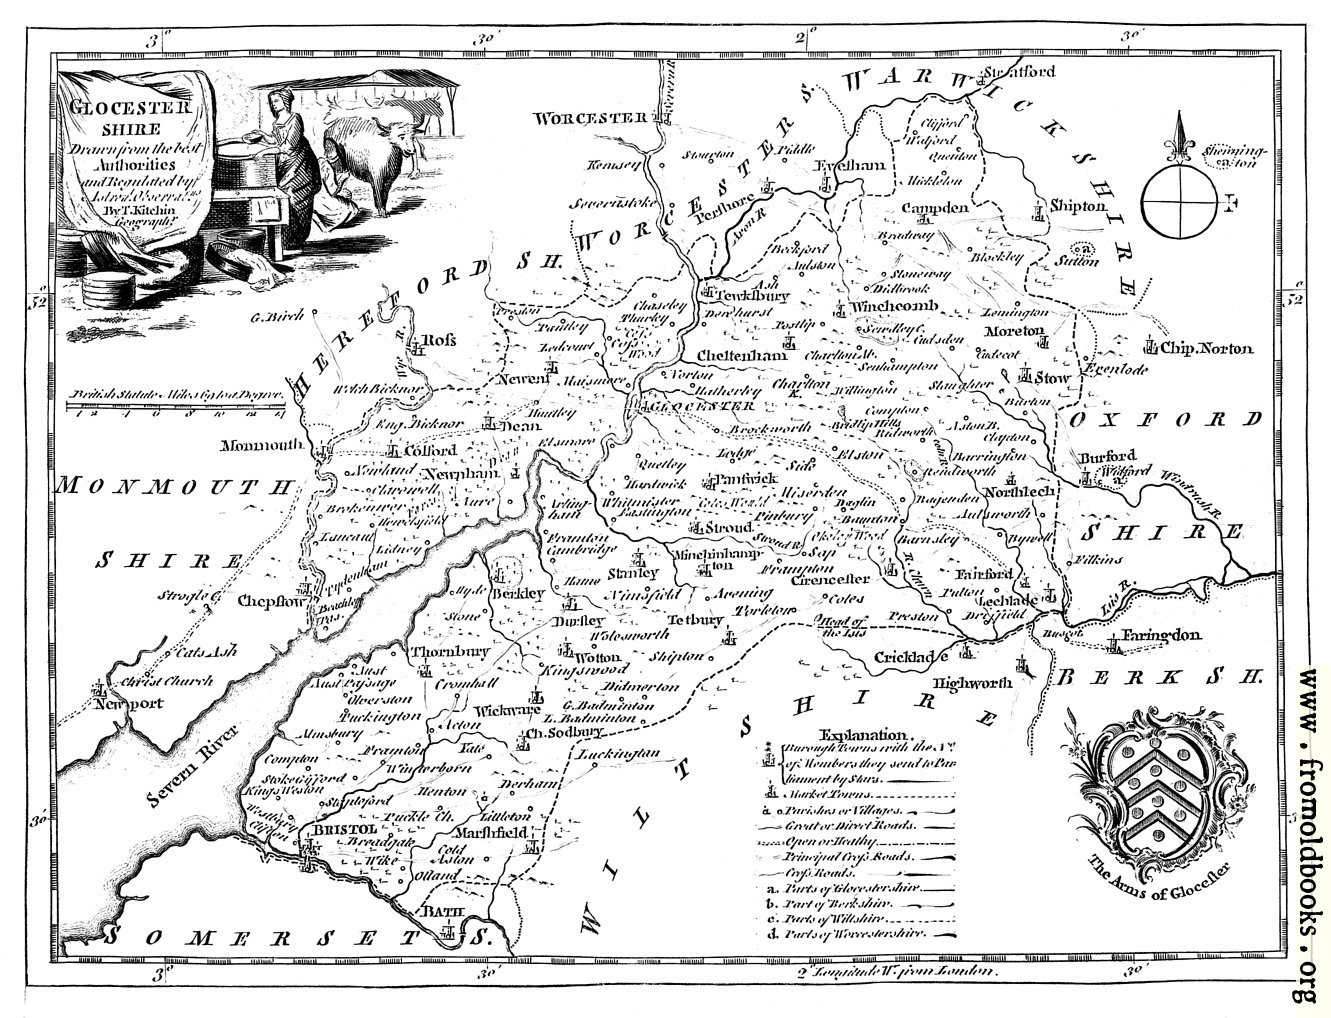 EighteenthCentury Map of Gloucestershire